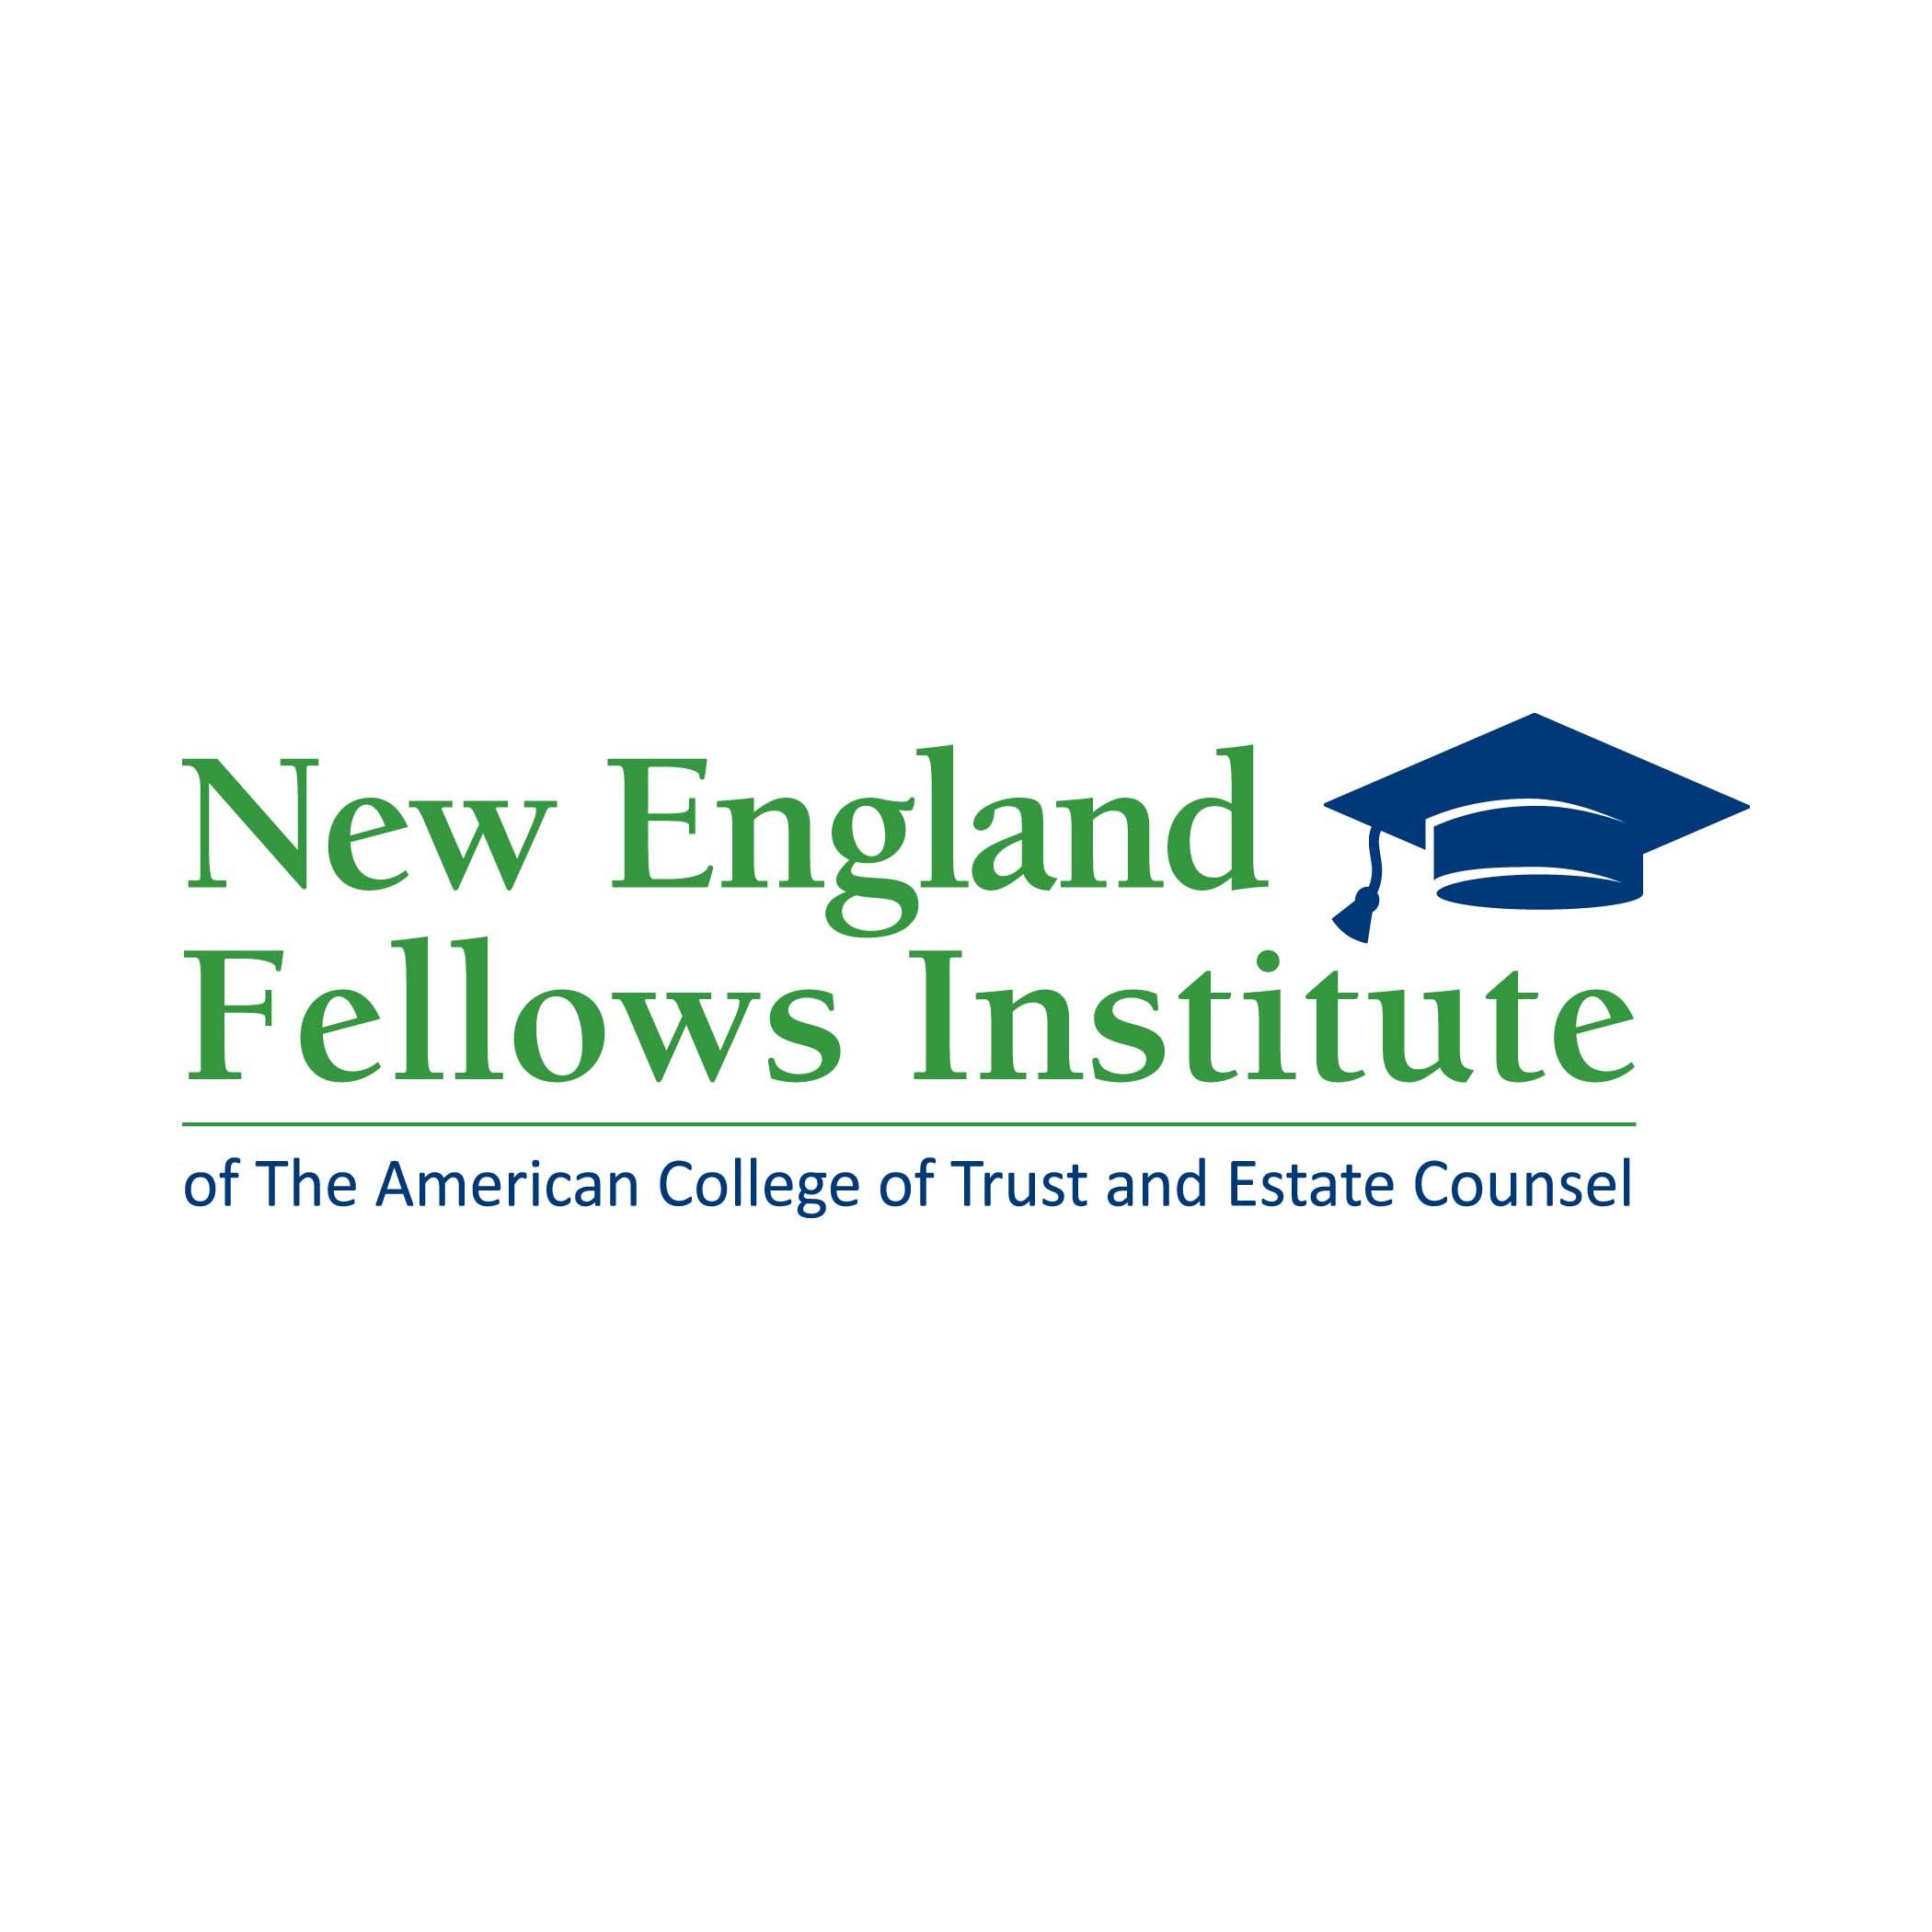 New England Fellows Institute